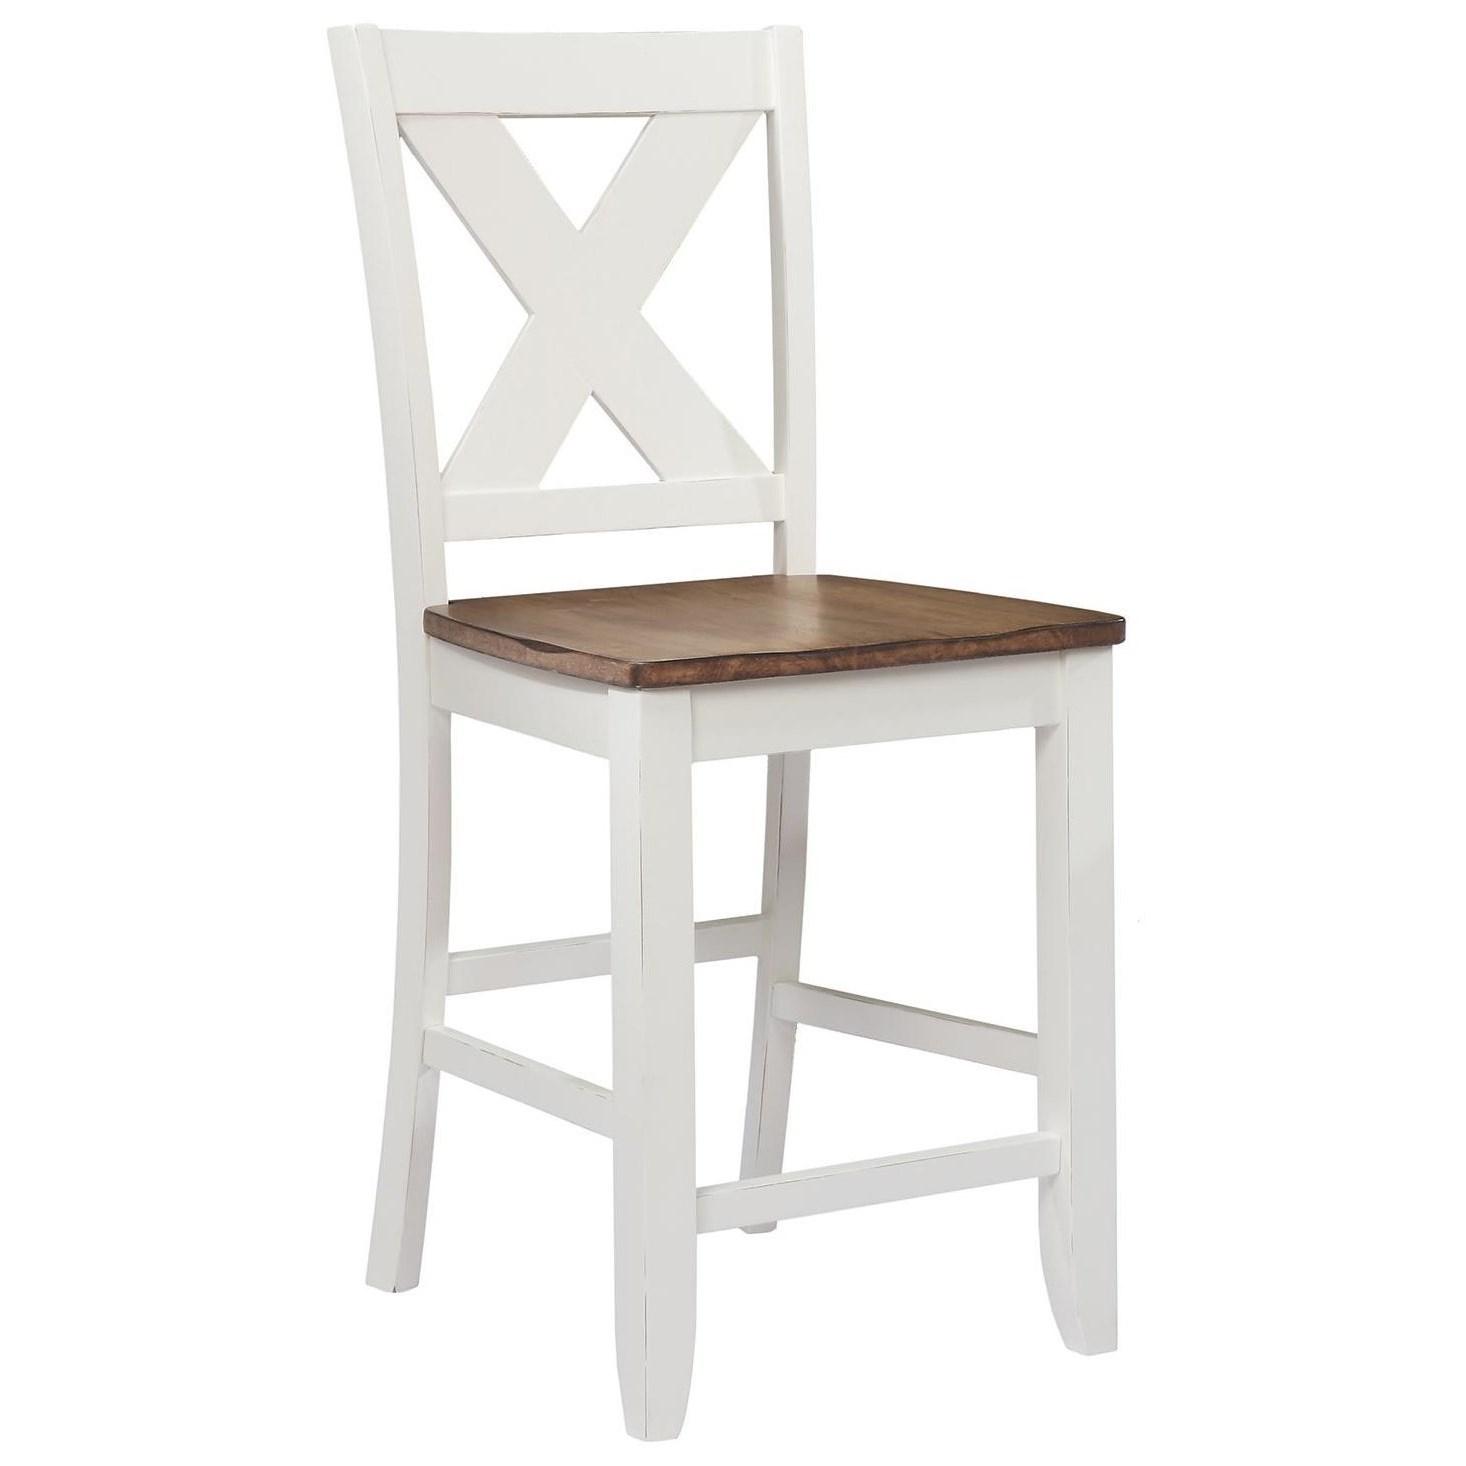 Awe Inspiring Pacifica X Back Counter Height Barstool Creativecarmelina Interior Chair Design Creativecarmelinacom